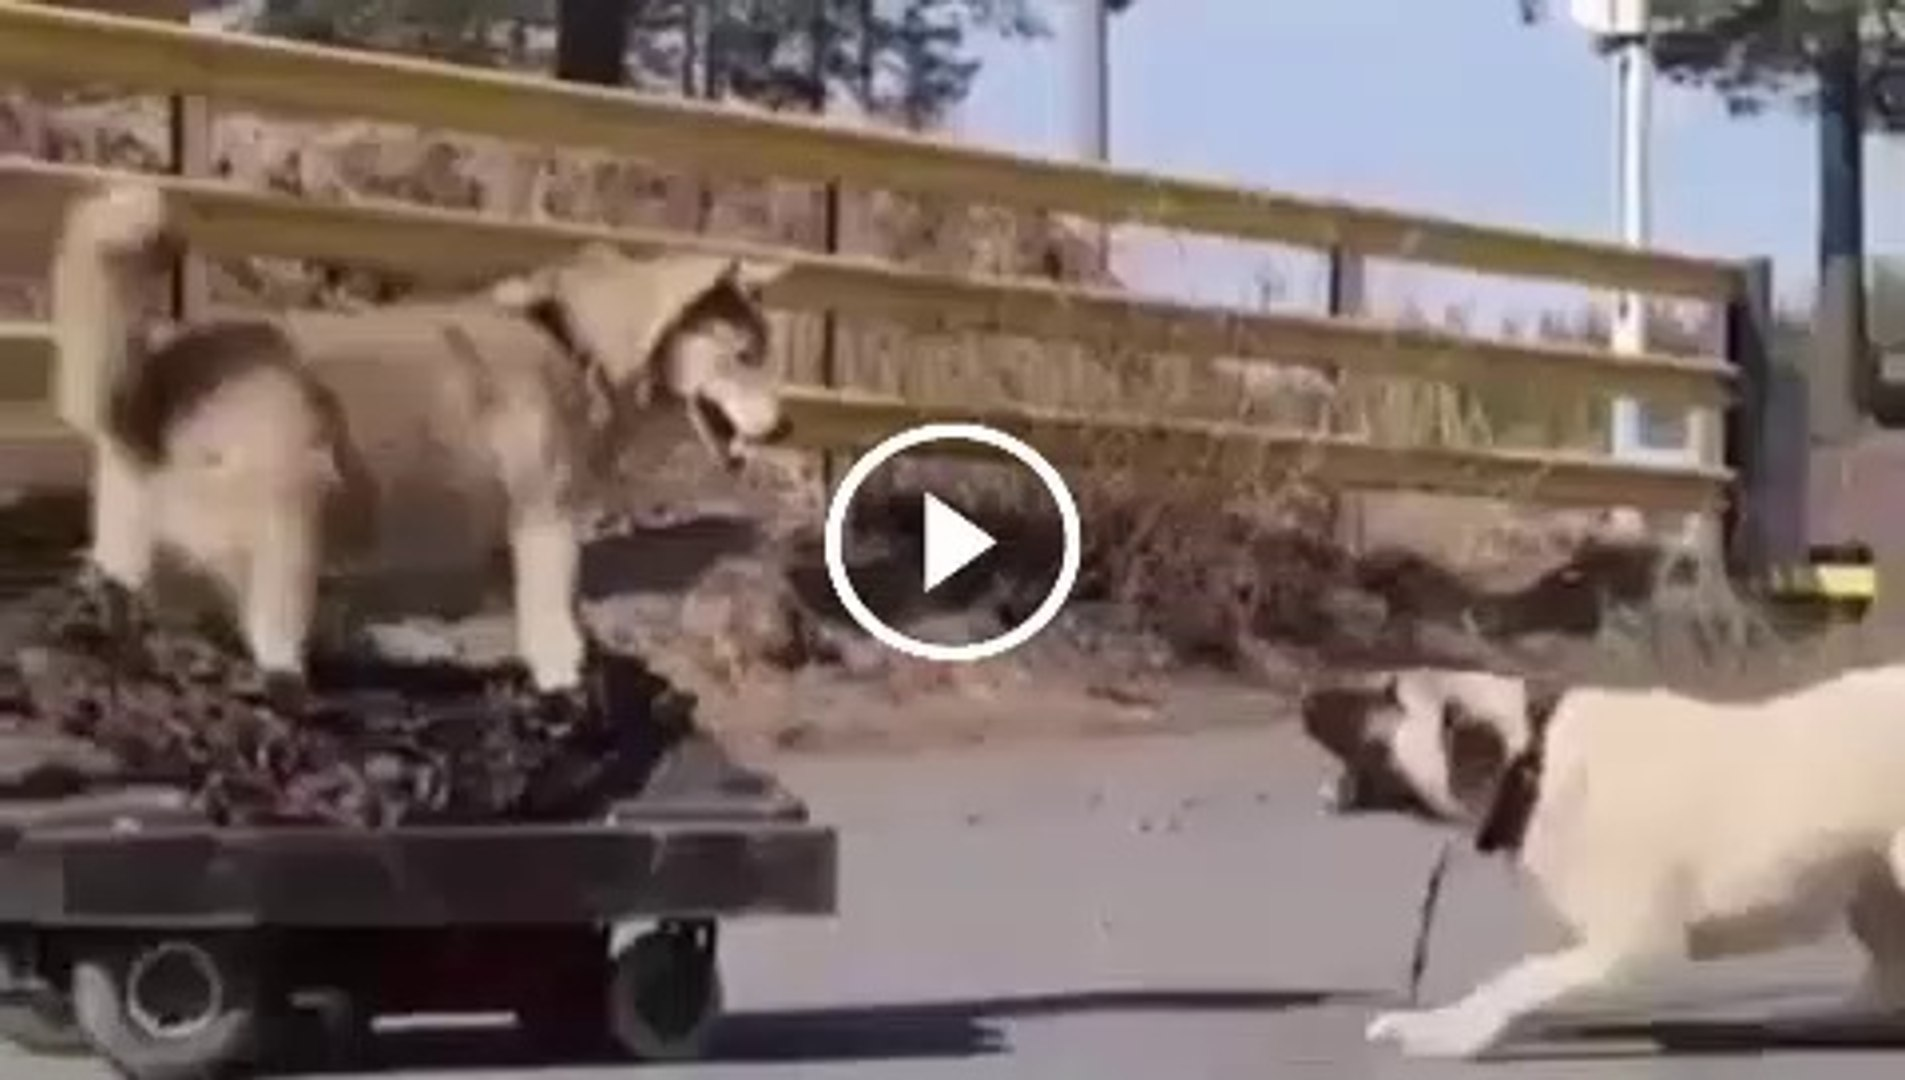 ANADOLU COBAN KOPEGi KURT DERSLERi - ANATOLiAN SHEPHERD DOG and WOLF CURSES